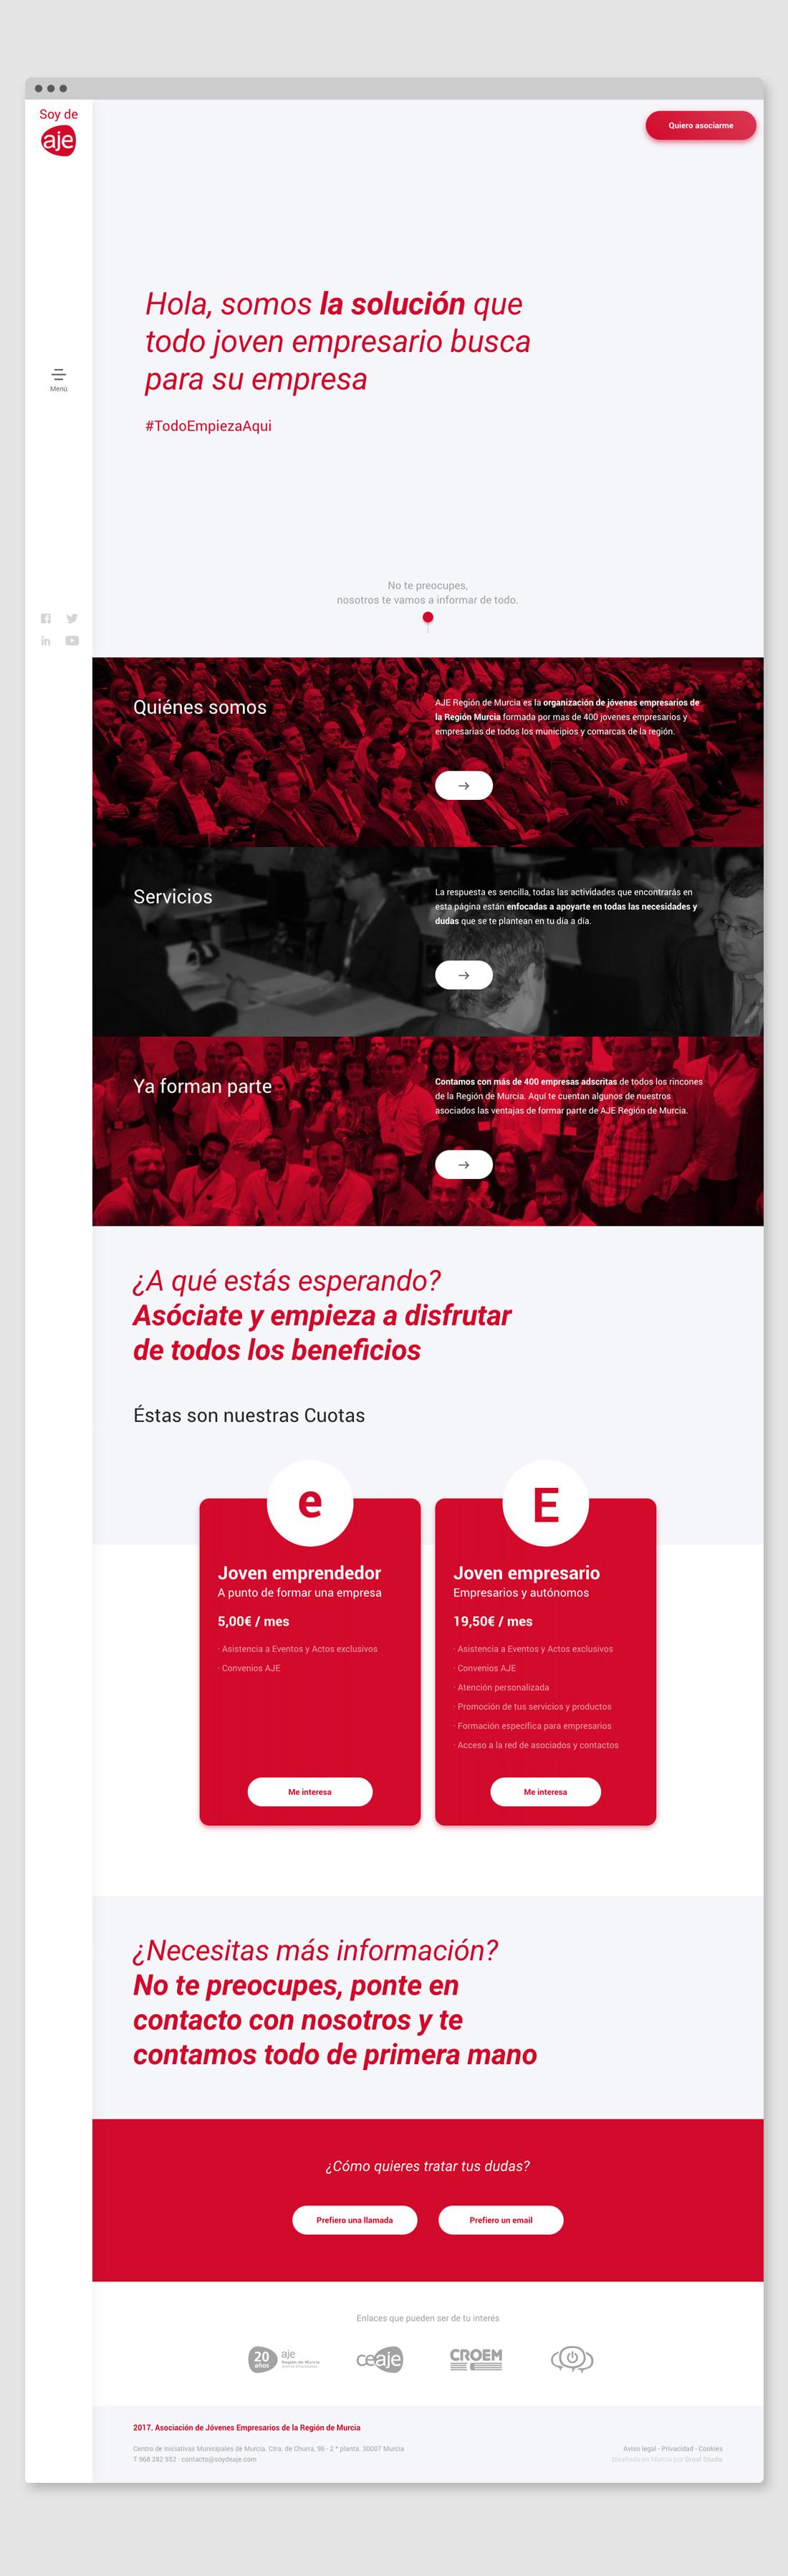 Diseño Full Width de Página web responsive de SOY DE AJE